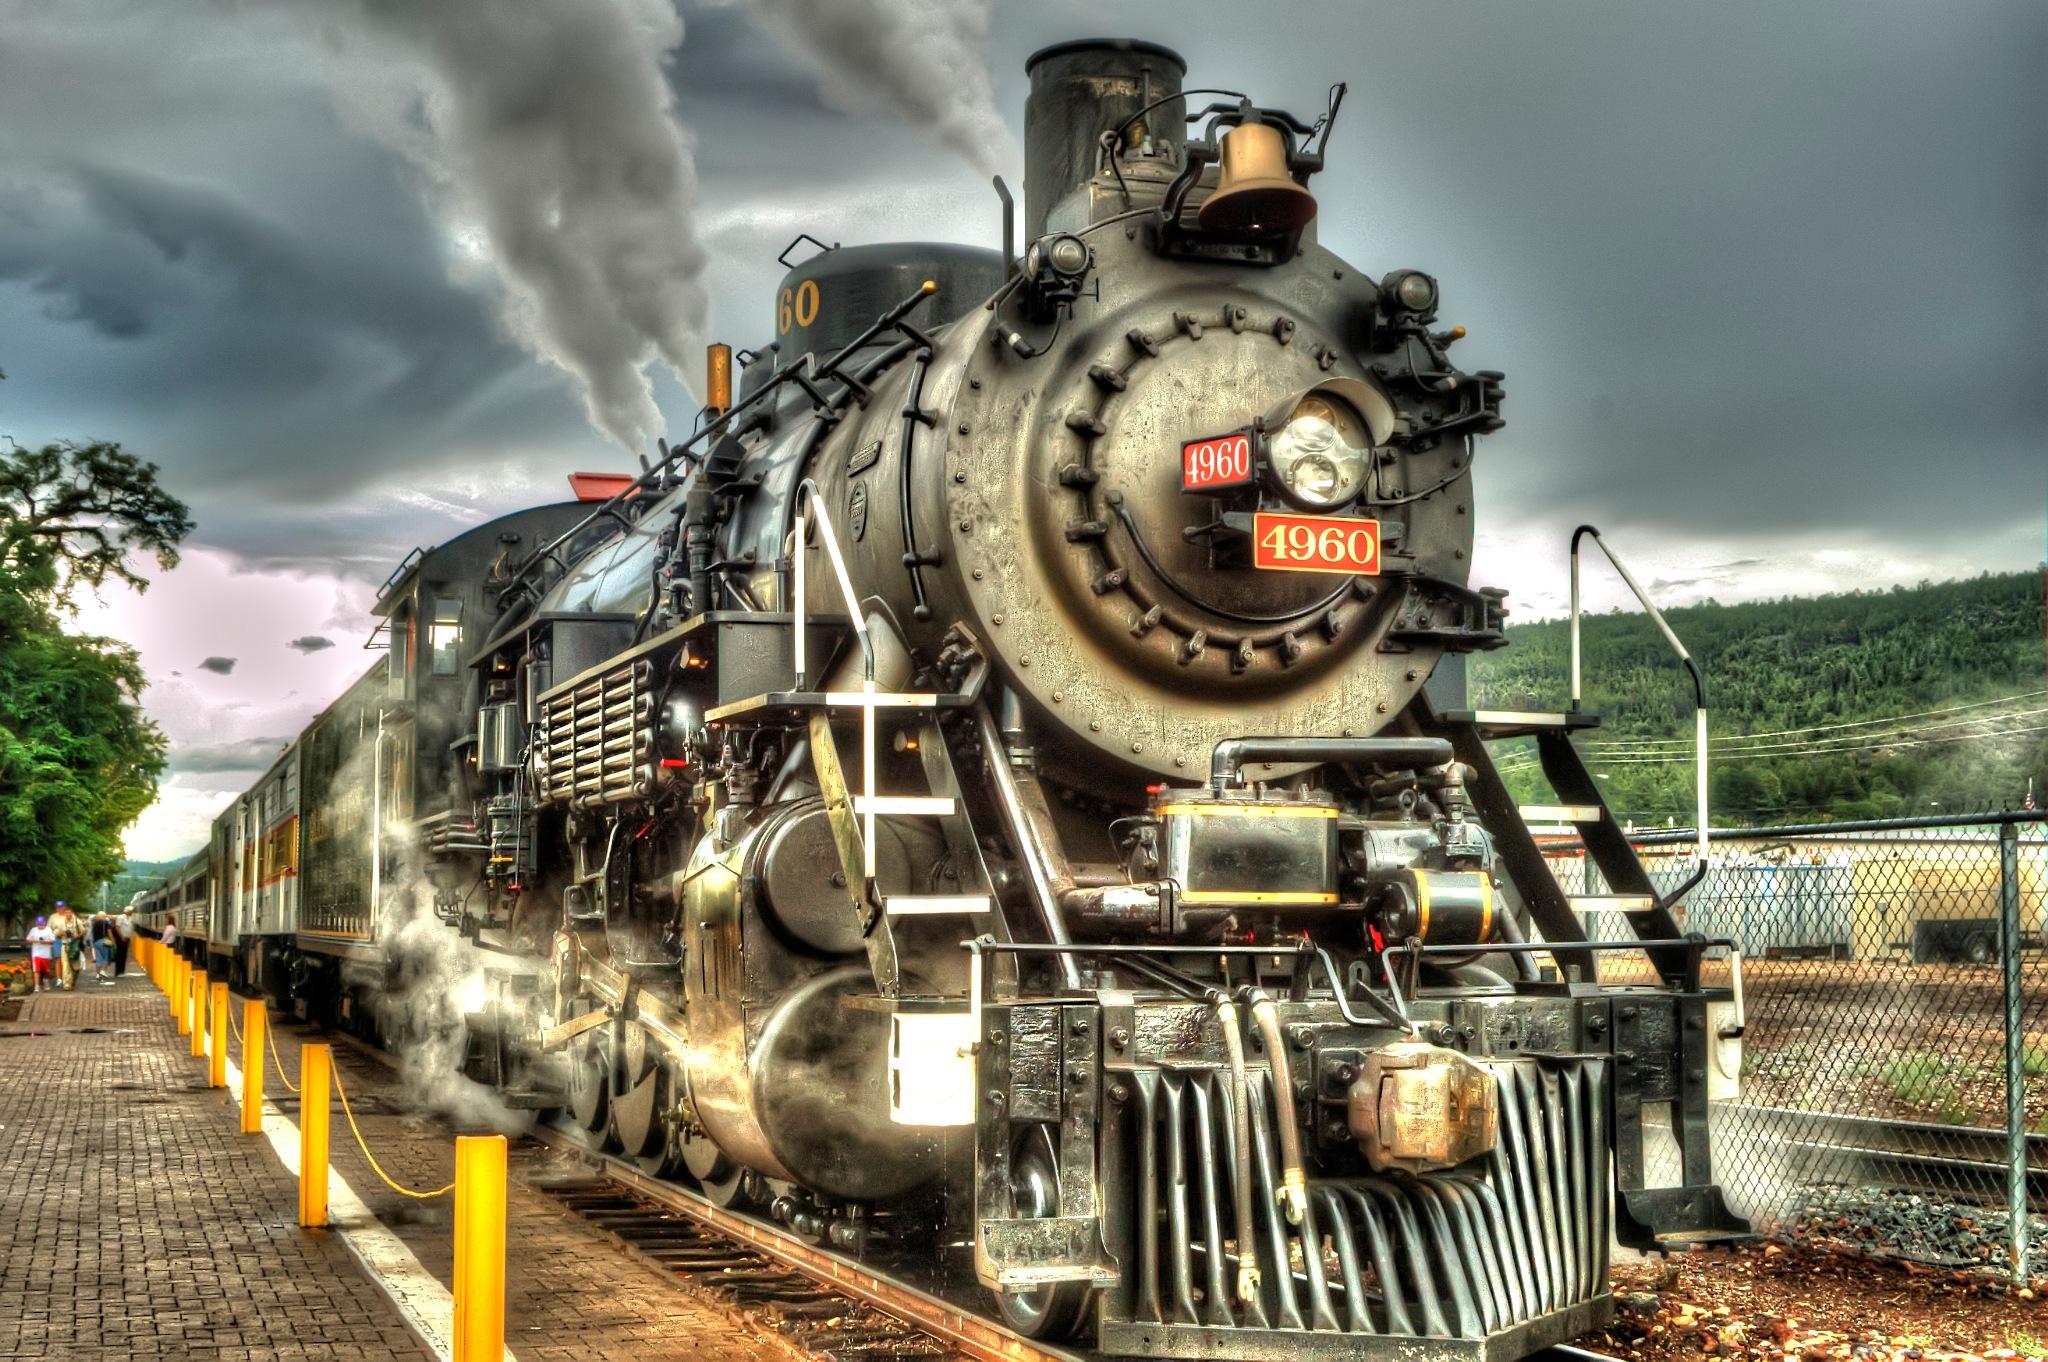 Engine 4960 by Paul Deveau